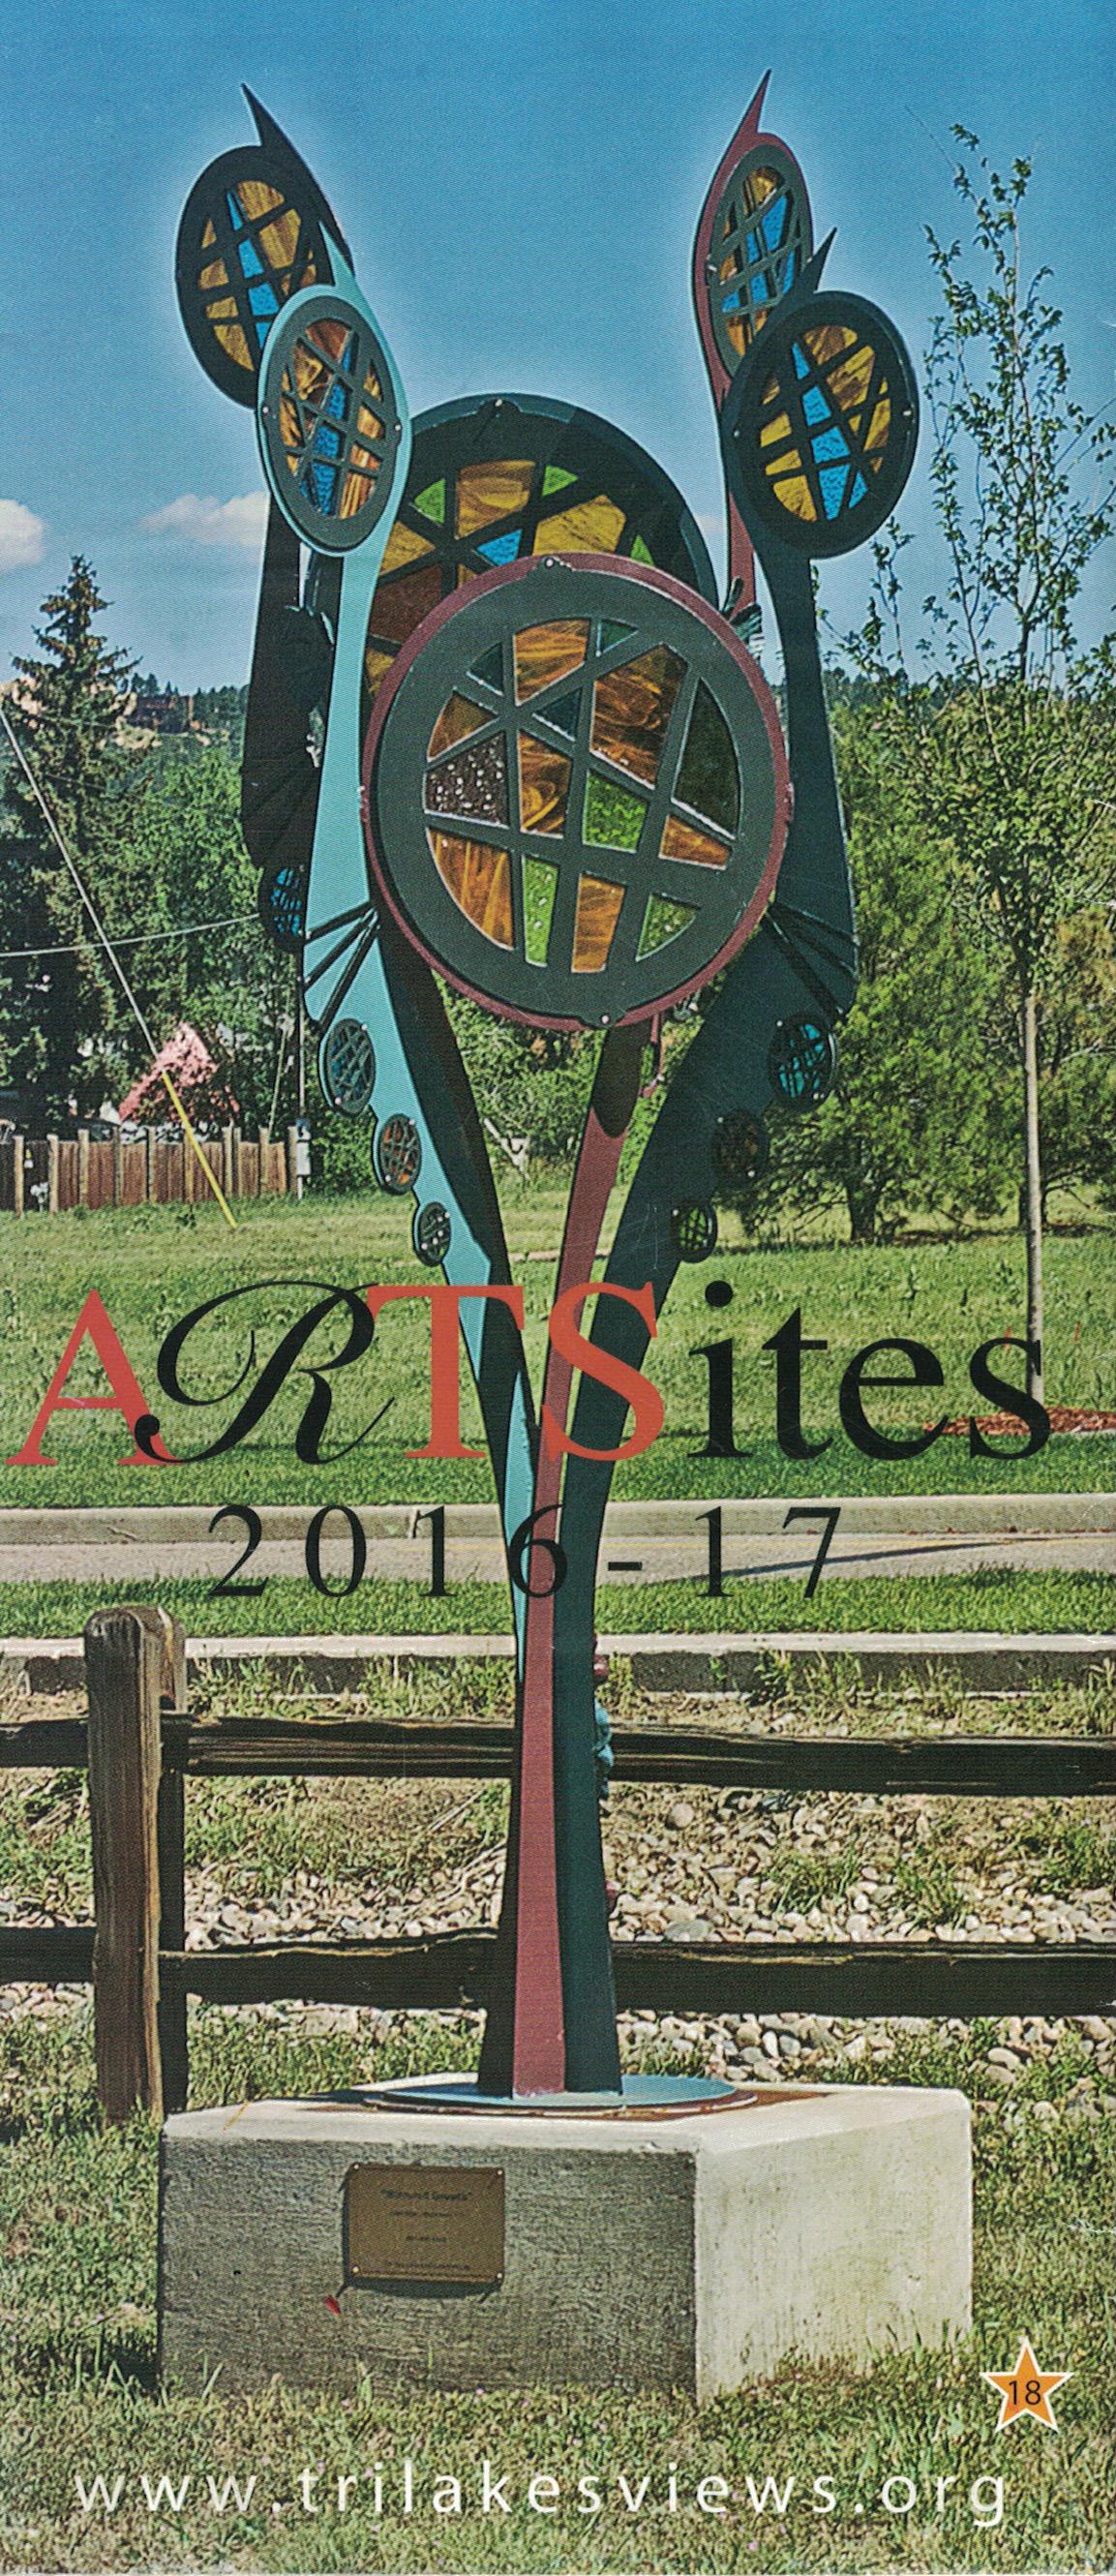 ART SITES SCAN 2016-2018.jpeg